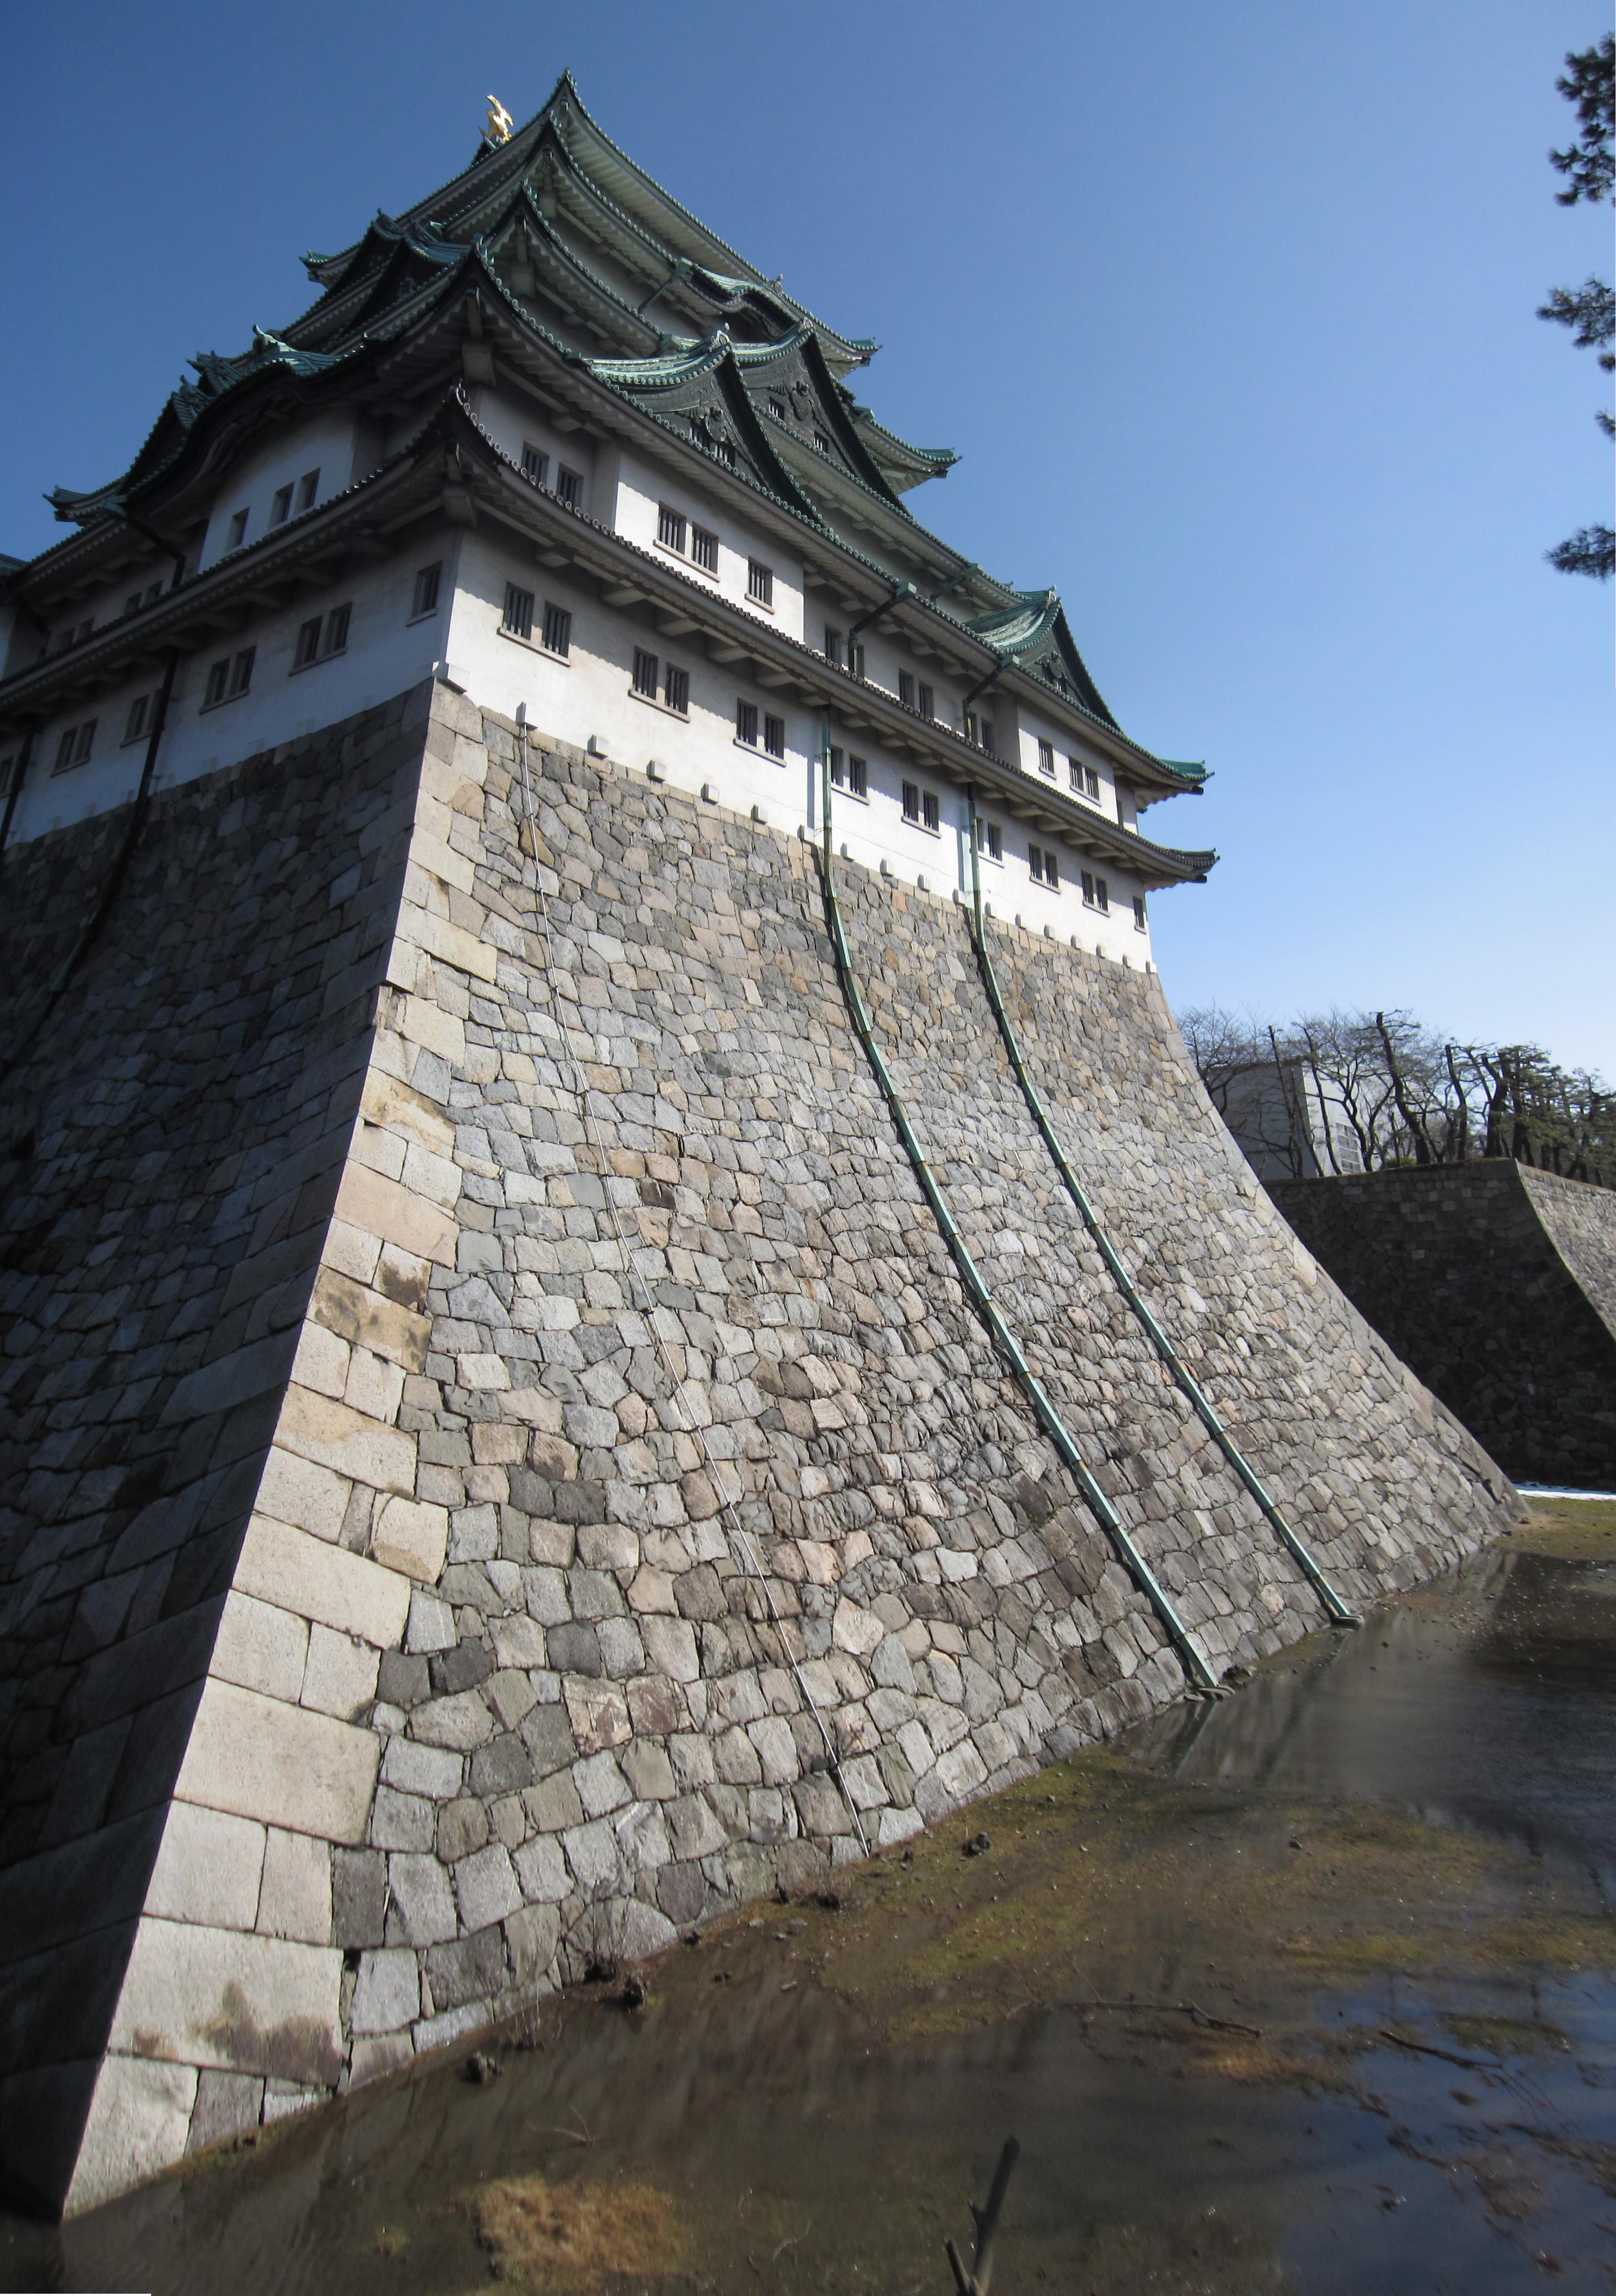 File:Nagoya Castle merged.jpg - Wikimedia Commons